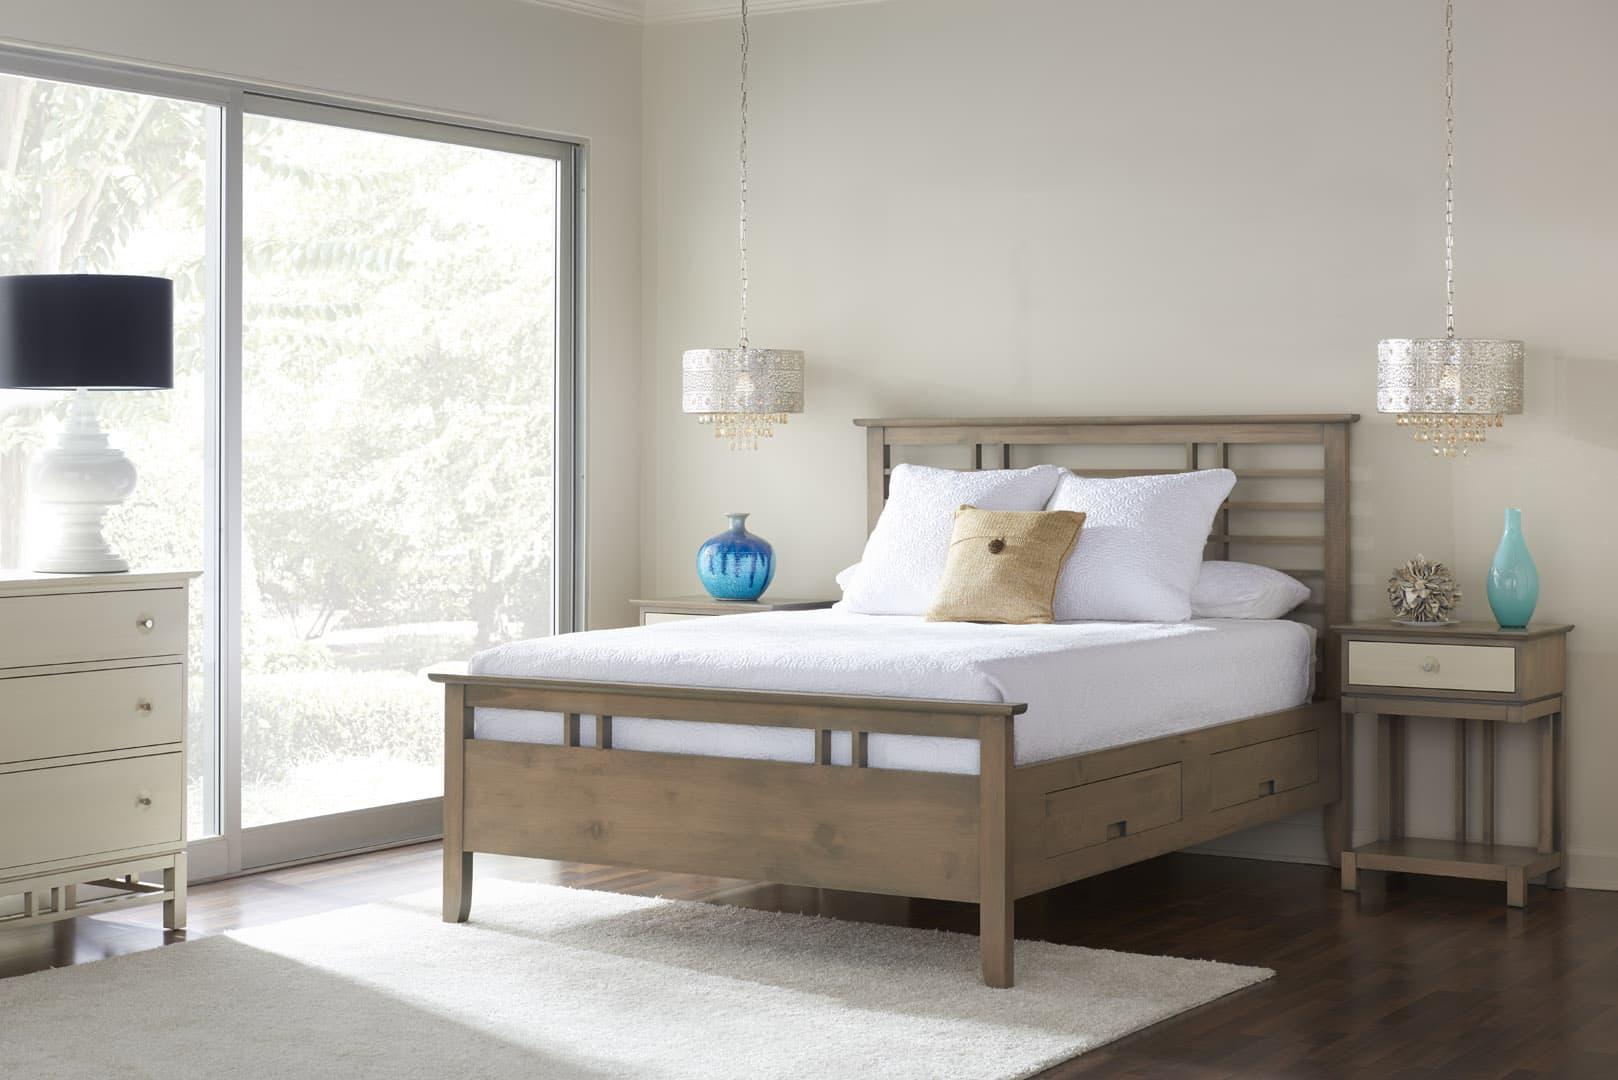 Bedroom-Evelyn-Bed-Gat-Creek-Minimalist